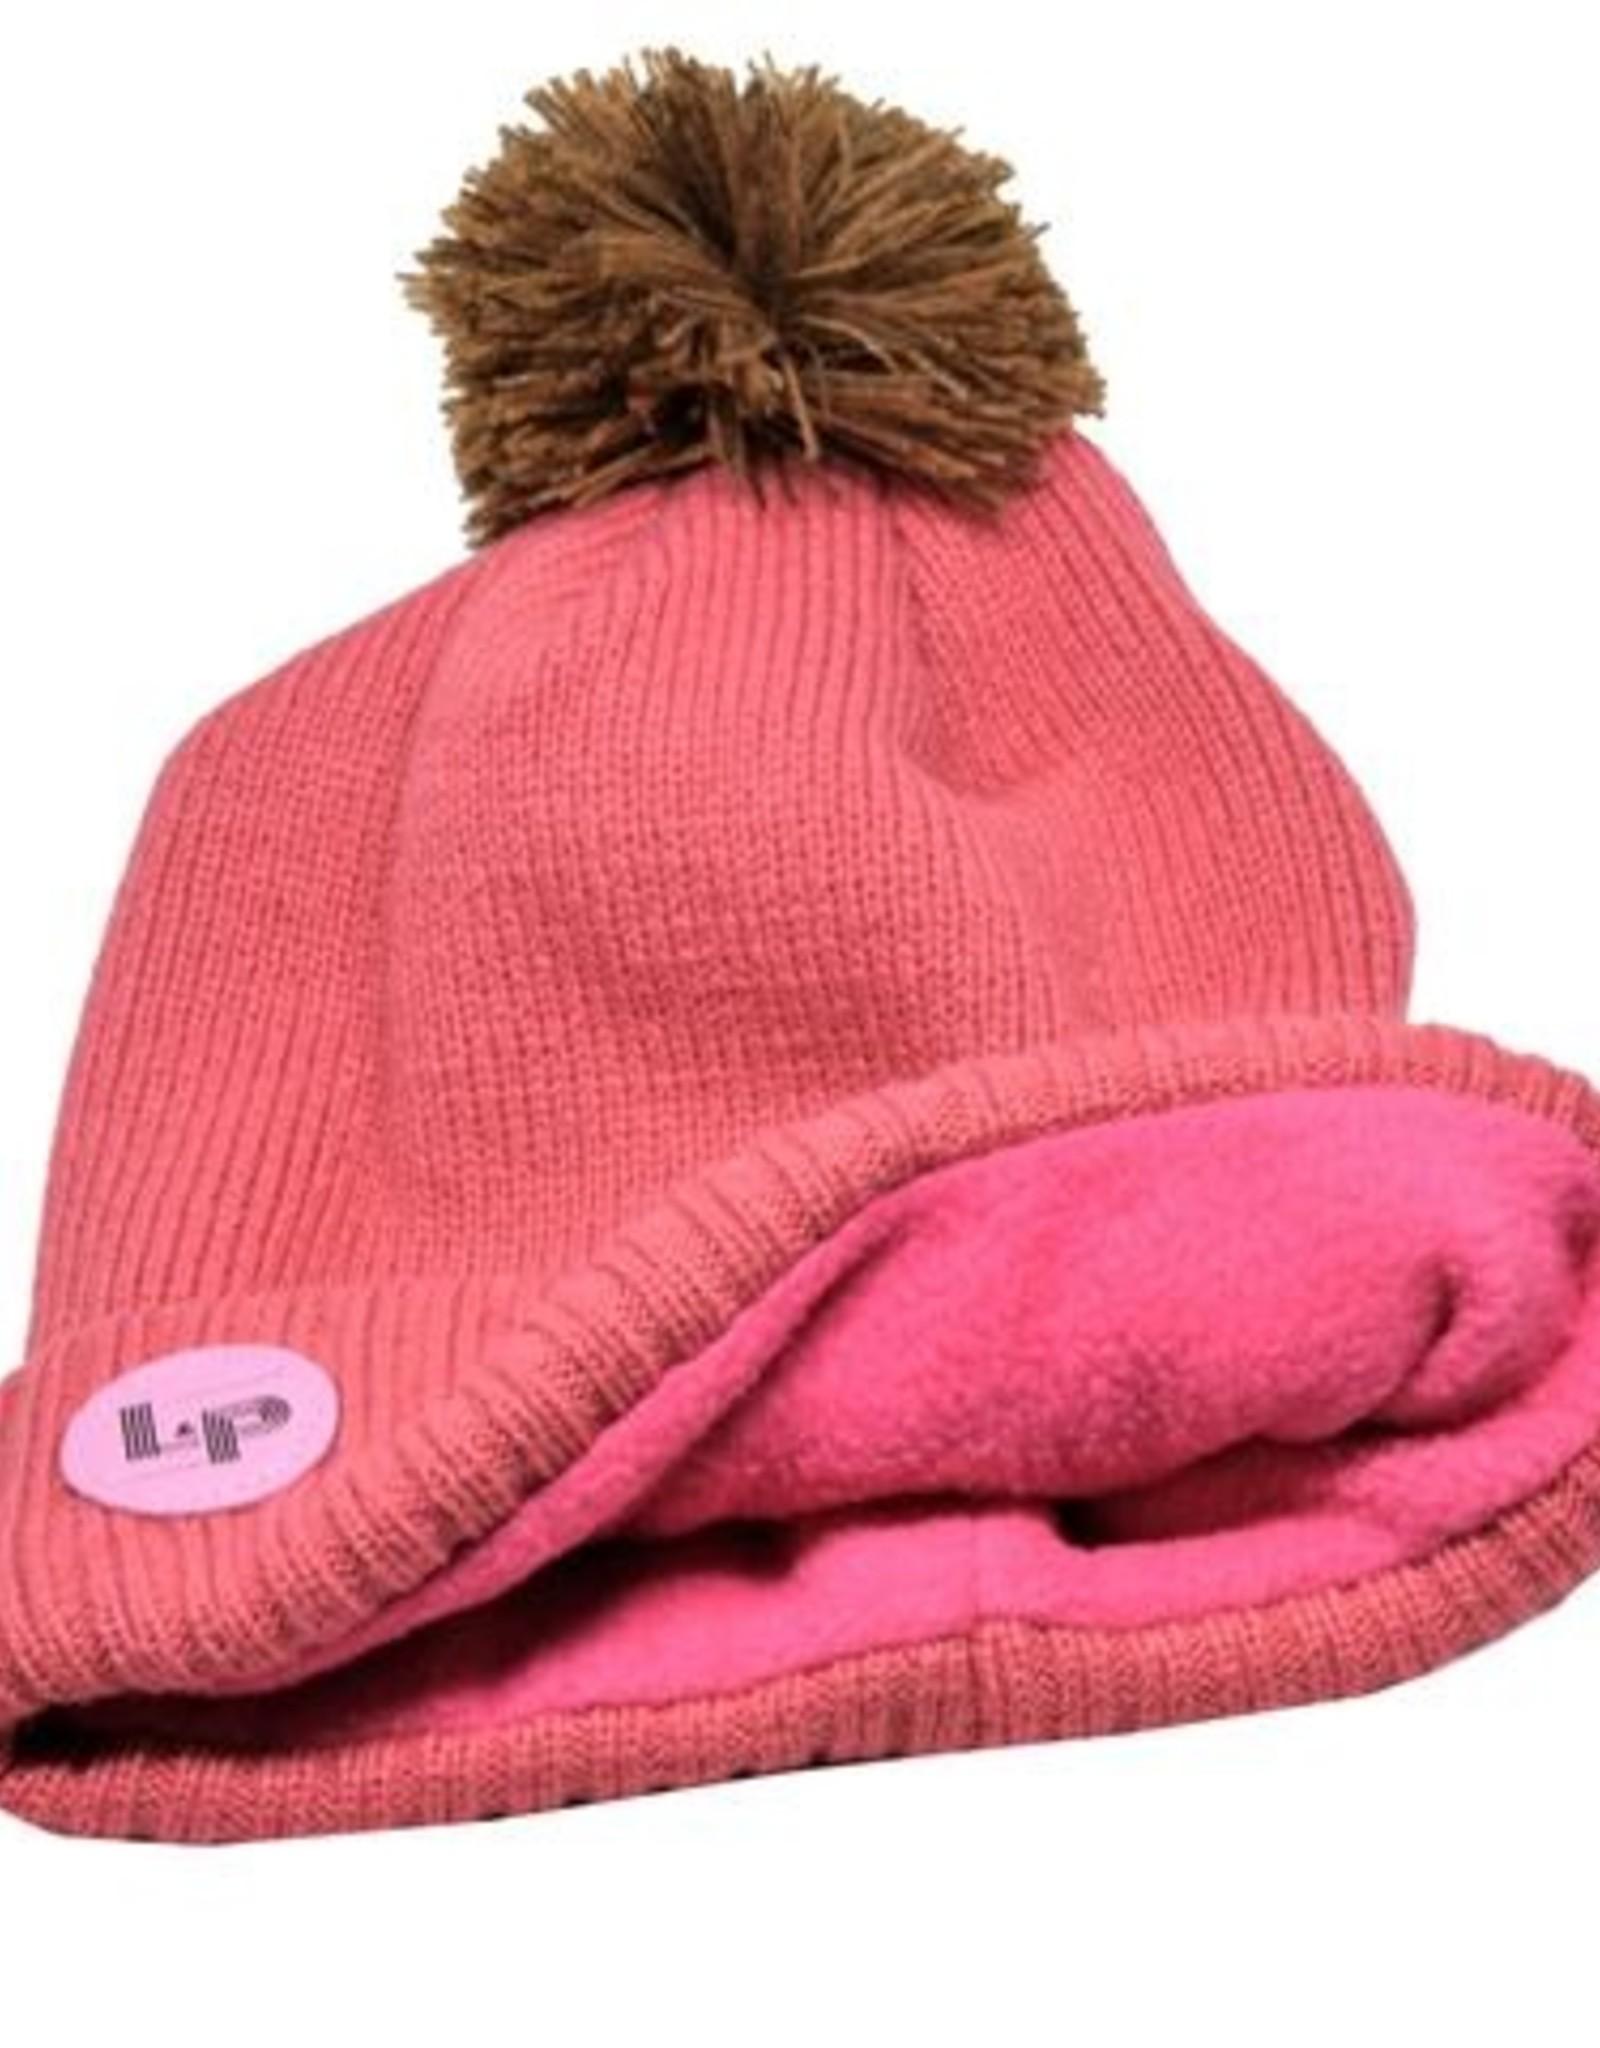 L & P - Bobble Knit Hat - Whistler